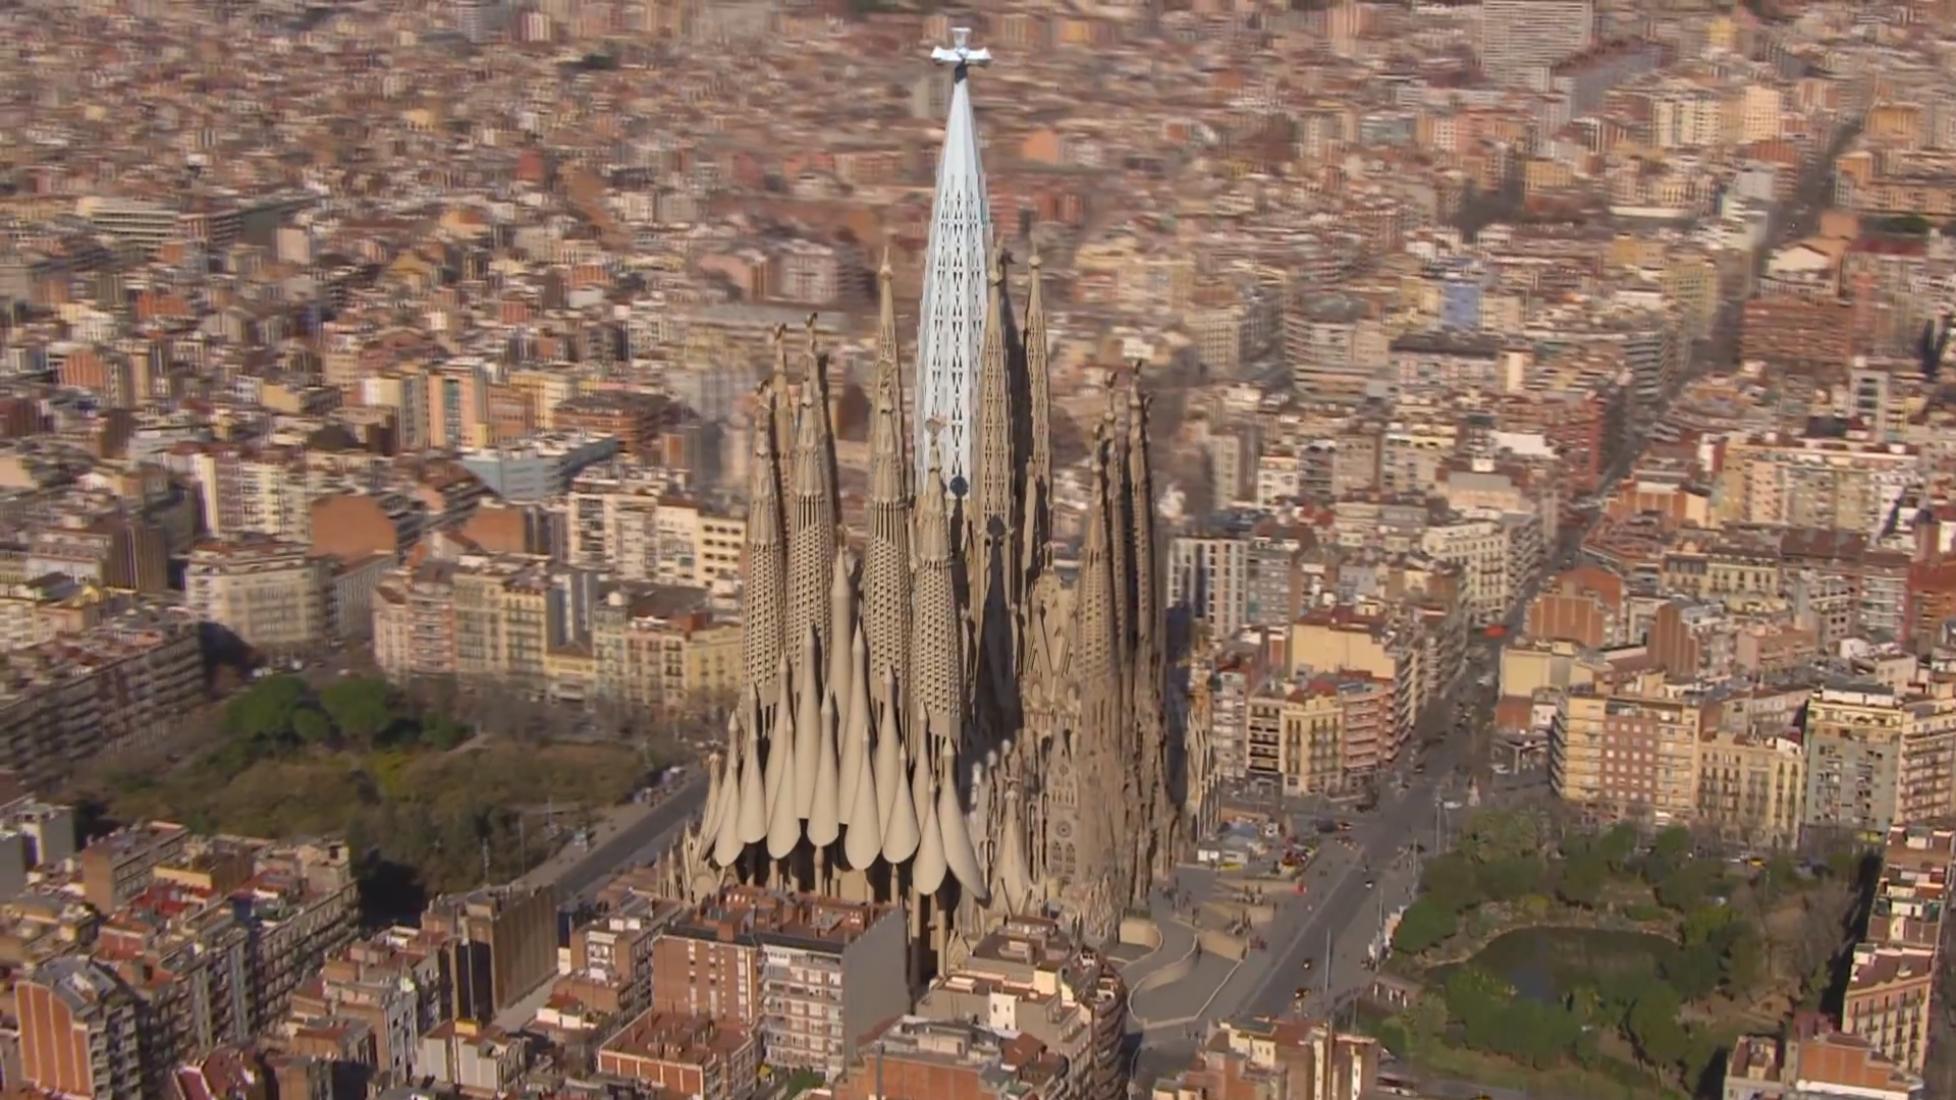 La Sagrada Familia por Gaudi en 2026